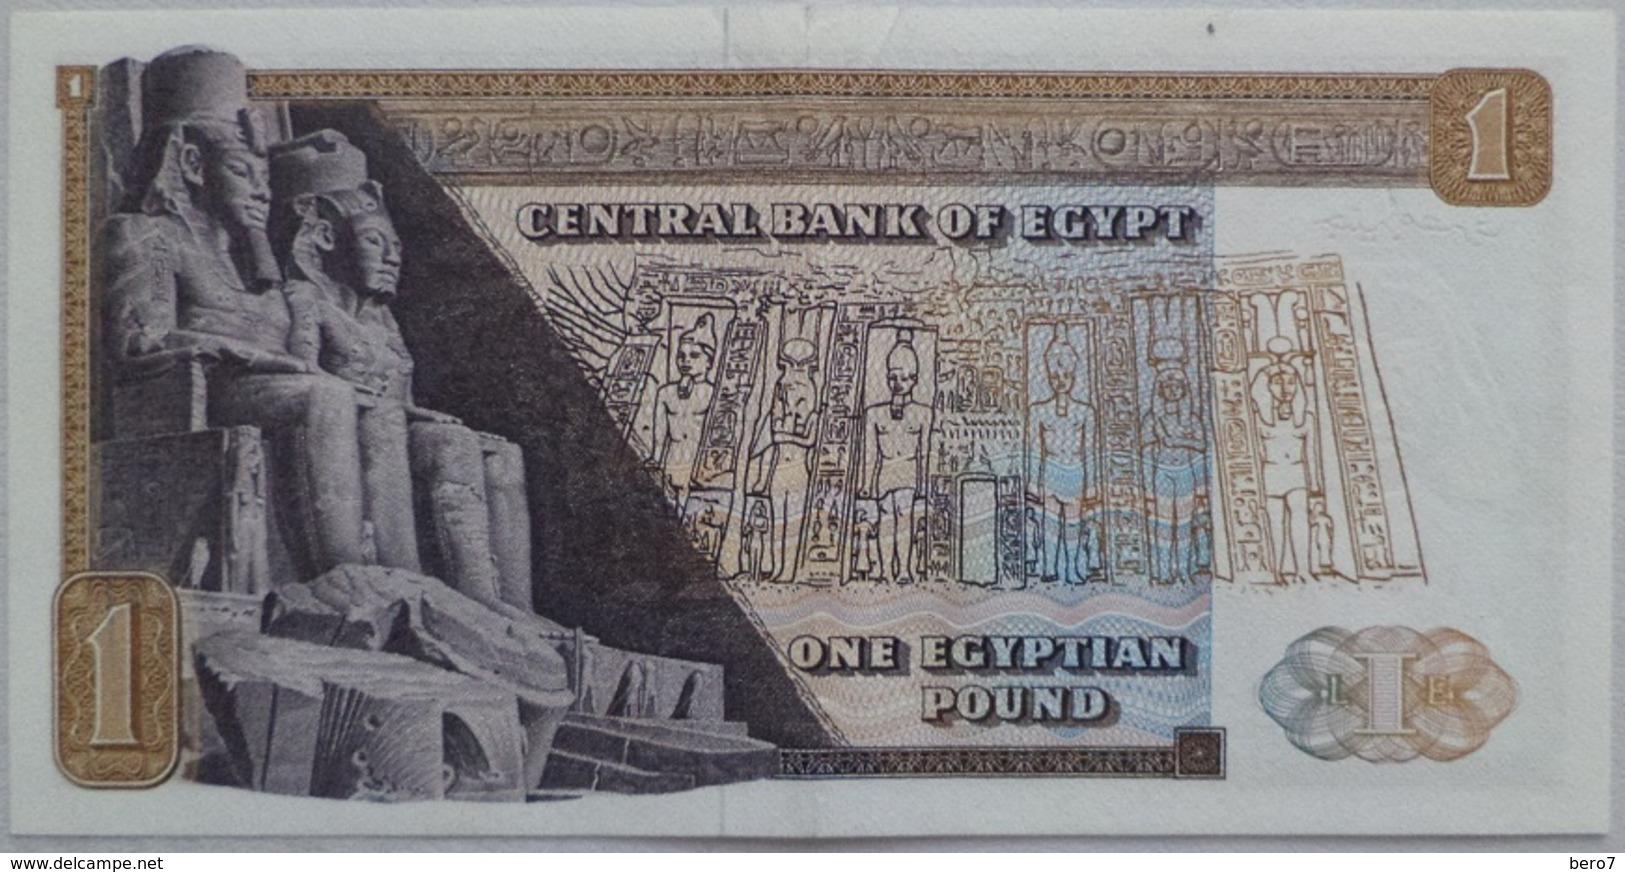 1 Pound Egypt - 19 September 1973 - SIG/ ِAhmed Zendo (Egypte) (Egitto) (Ägypten) (Egipto) (Egypten)  Africa - Egypte